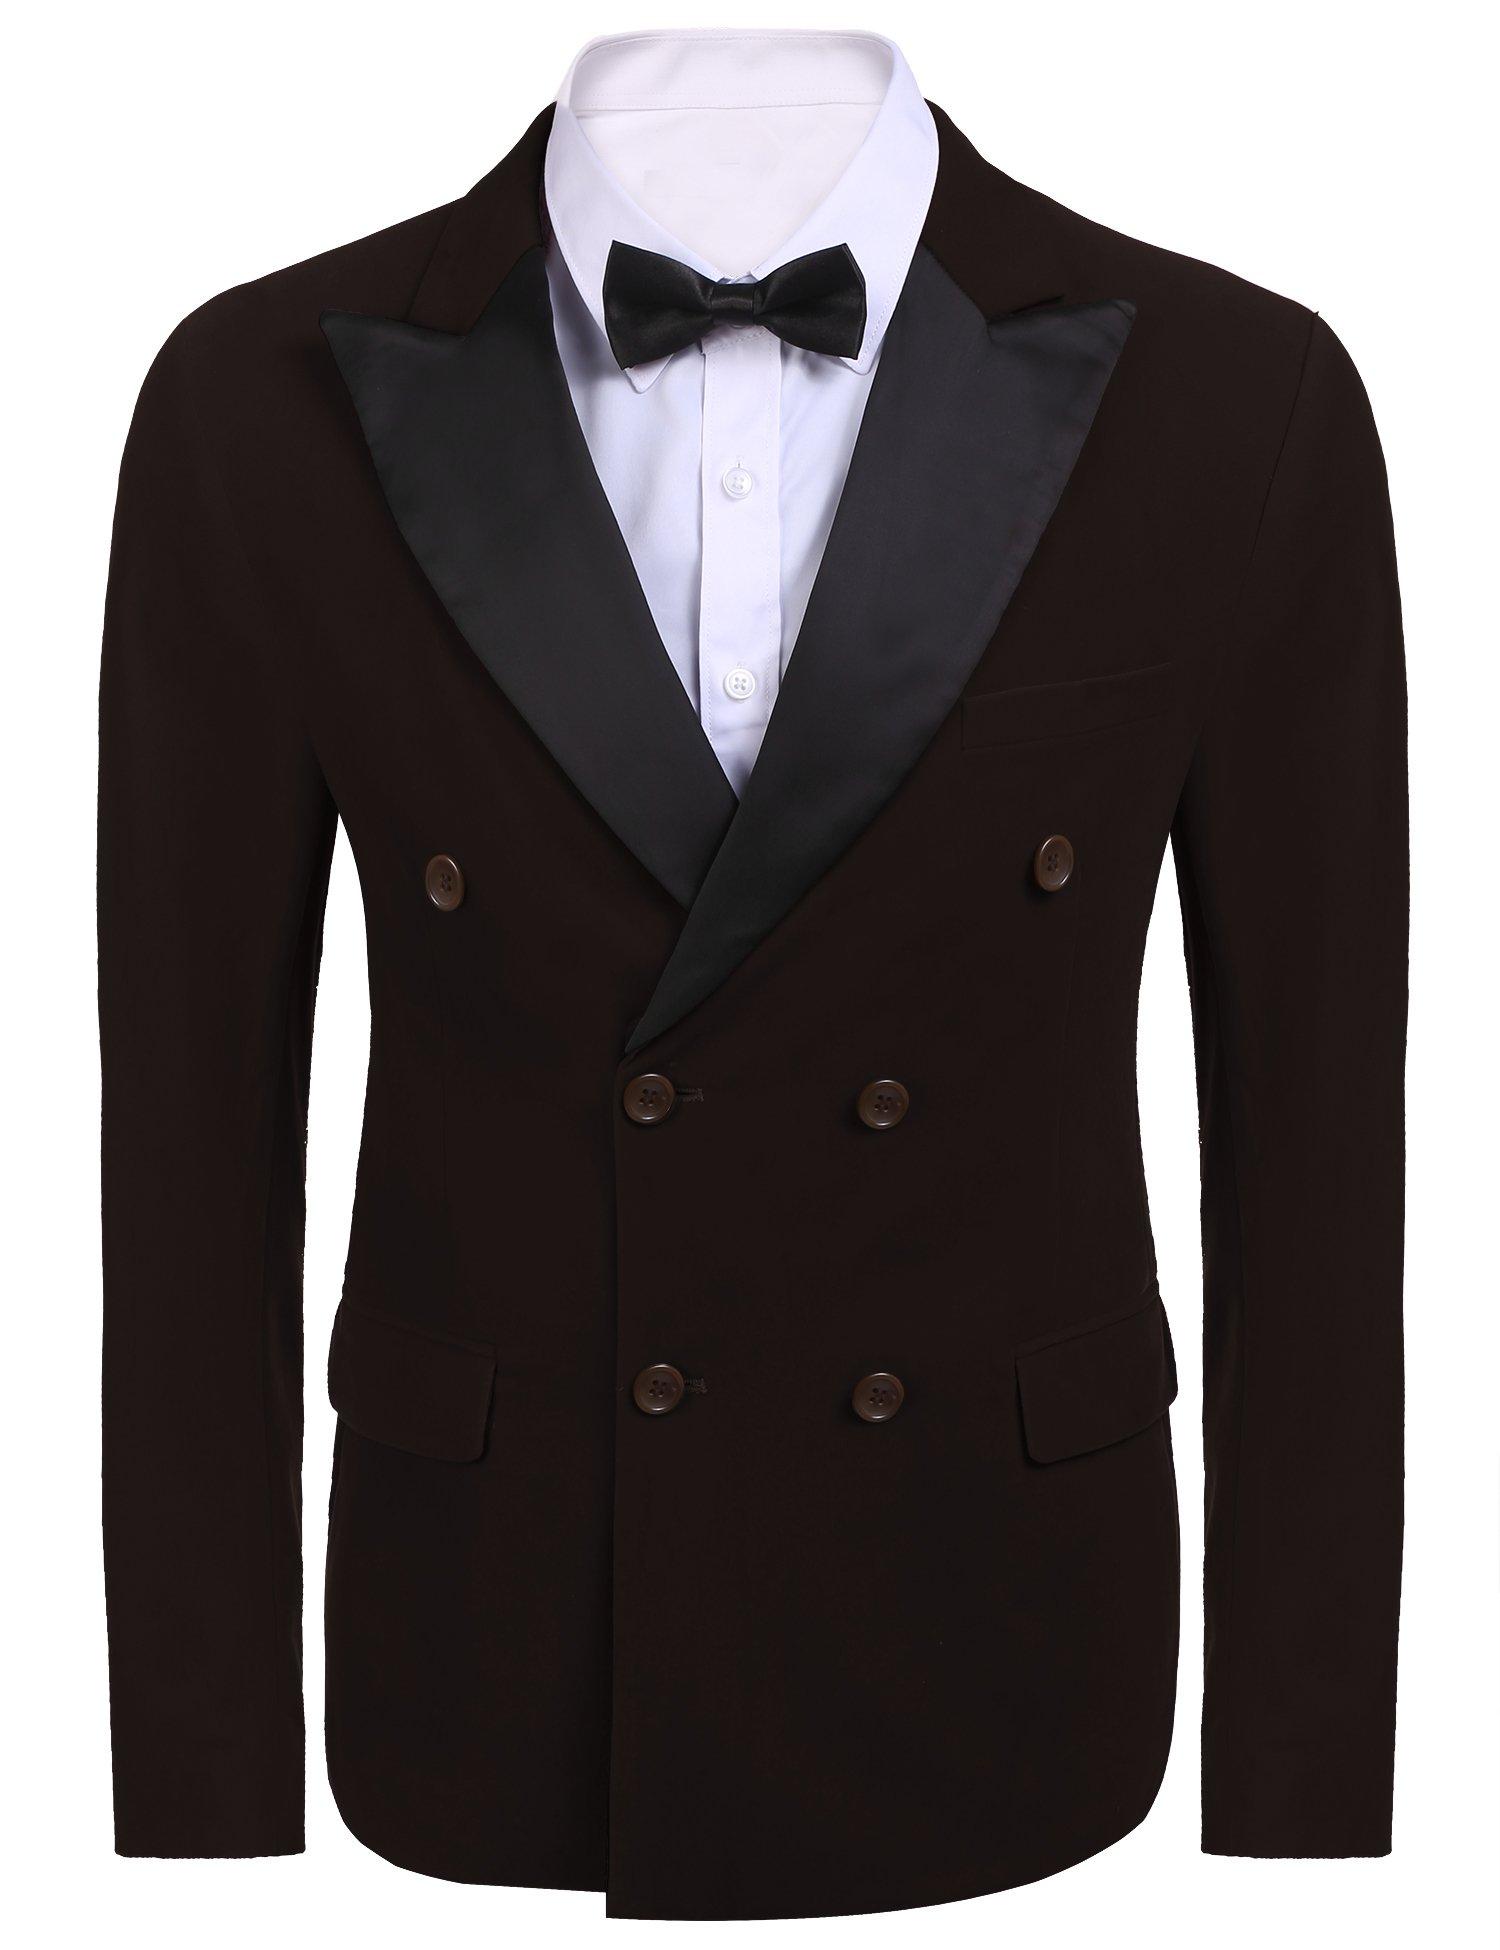 JINIDU Men's Modern Tuxedo Jacket One Button Casual Suit Blazer Jacket for Dinner, Party, Wedding, Prom